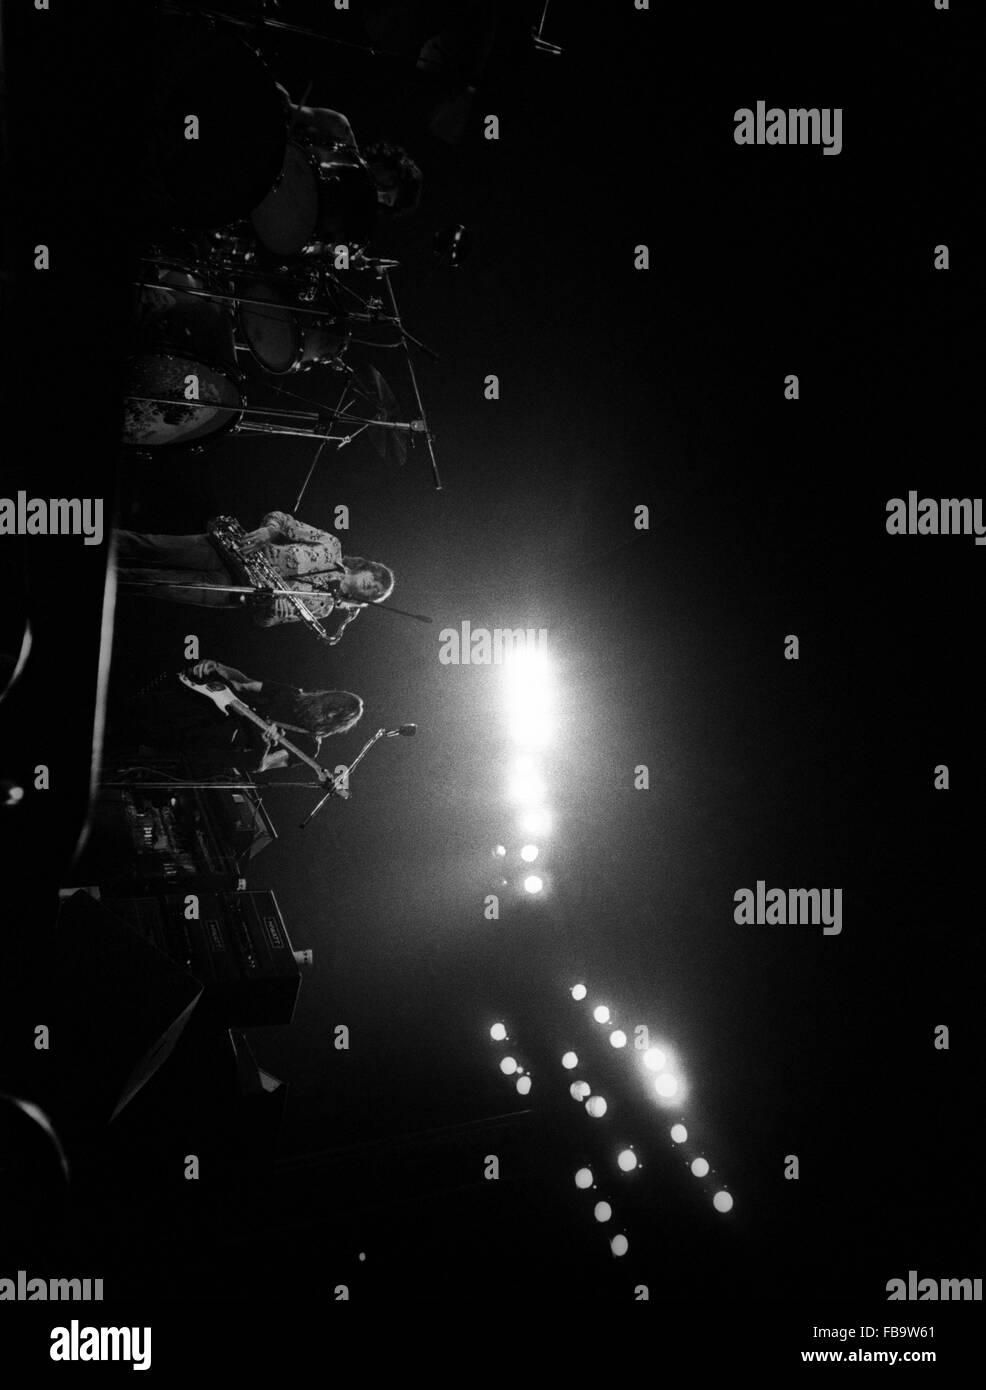 The english Rock band PINK FLOYD. -    -  The english Rock band PINK FLOYD. -  The PINK FLOYD on-stage.   -  Philippe - Stock Image